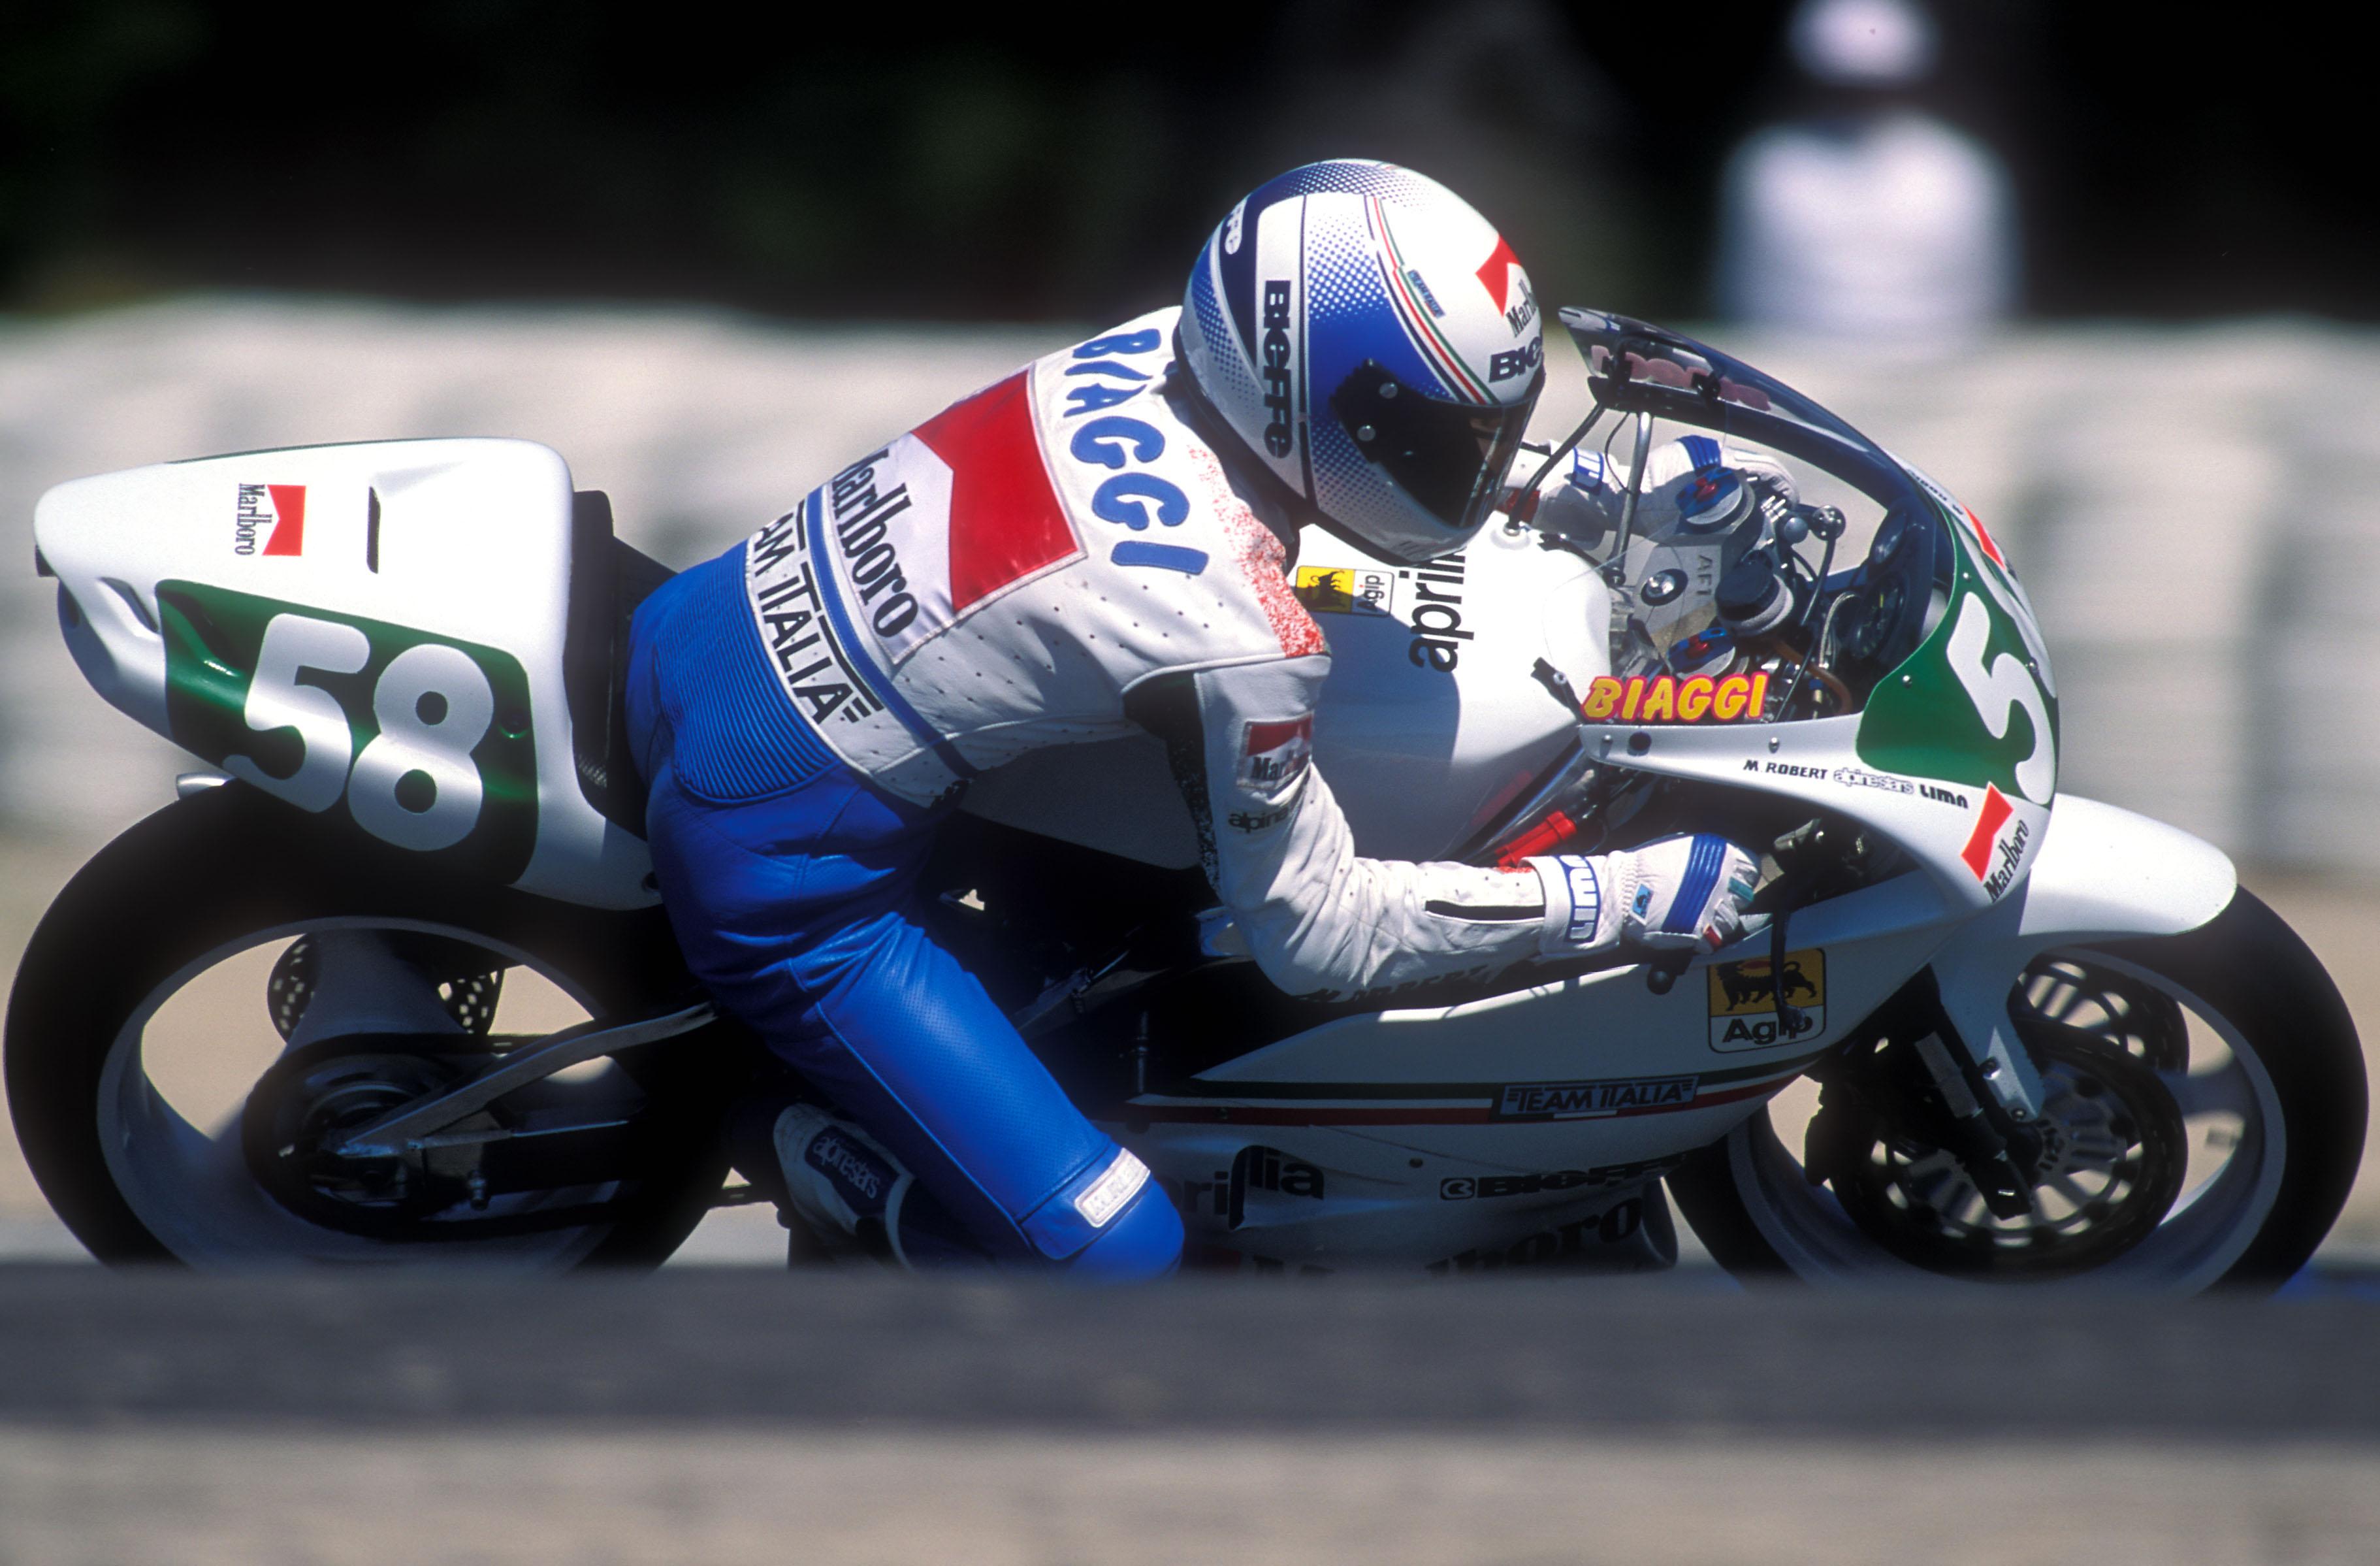 La carrera deportiva de Max Biaggi